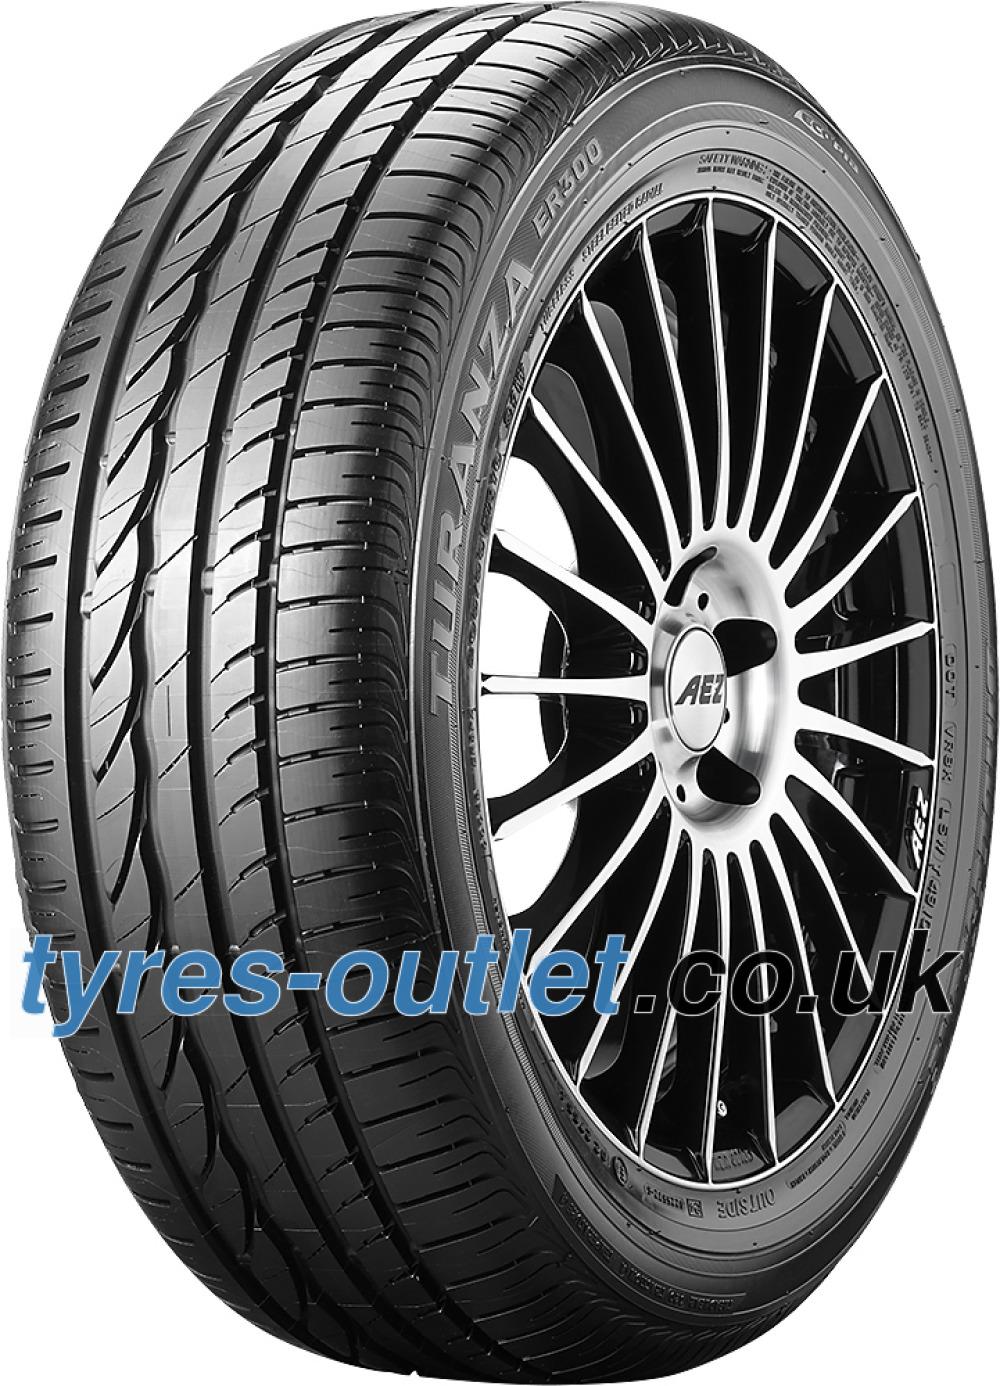 Bridgestone Turanza ER 300 Ecopia ( 215/55 R17 94W with rim protection (MFS) )